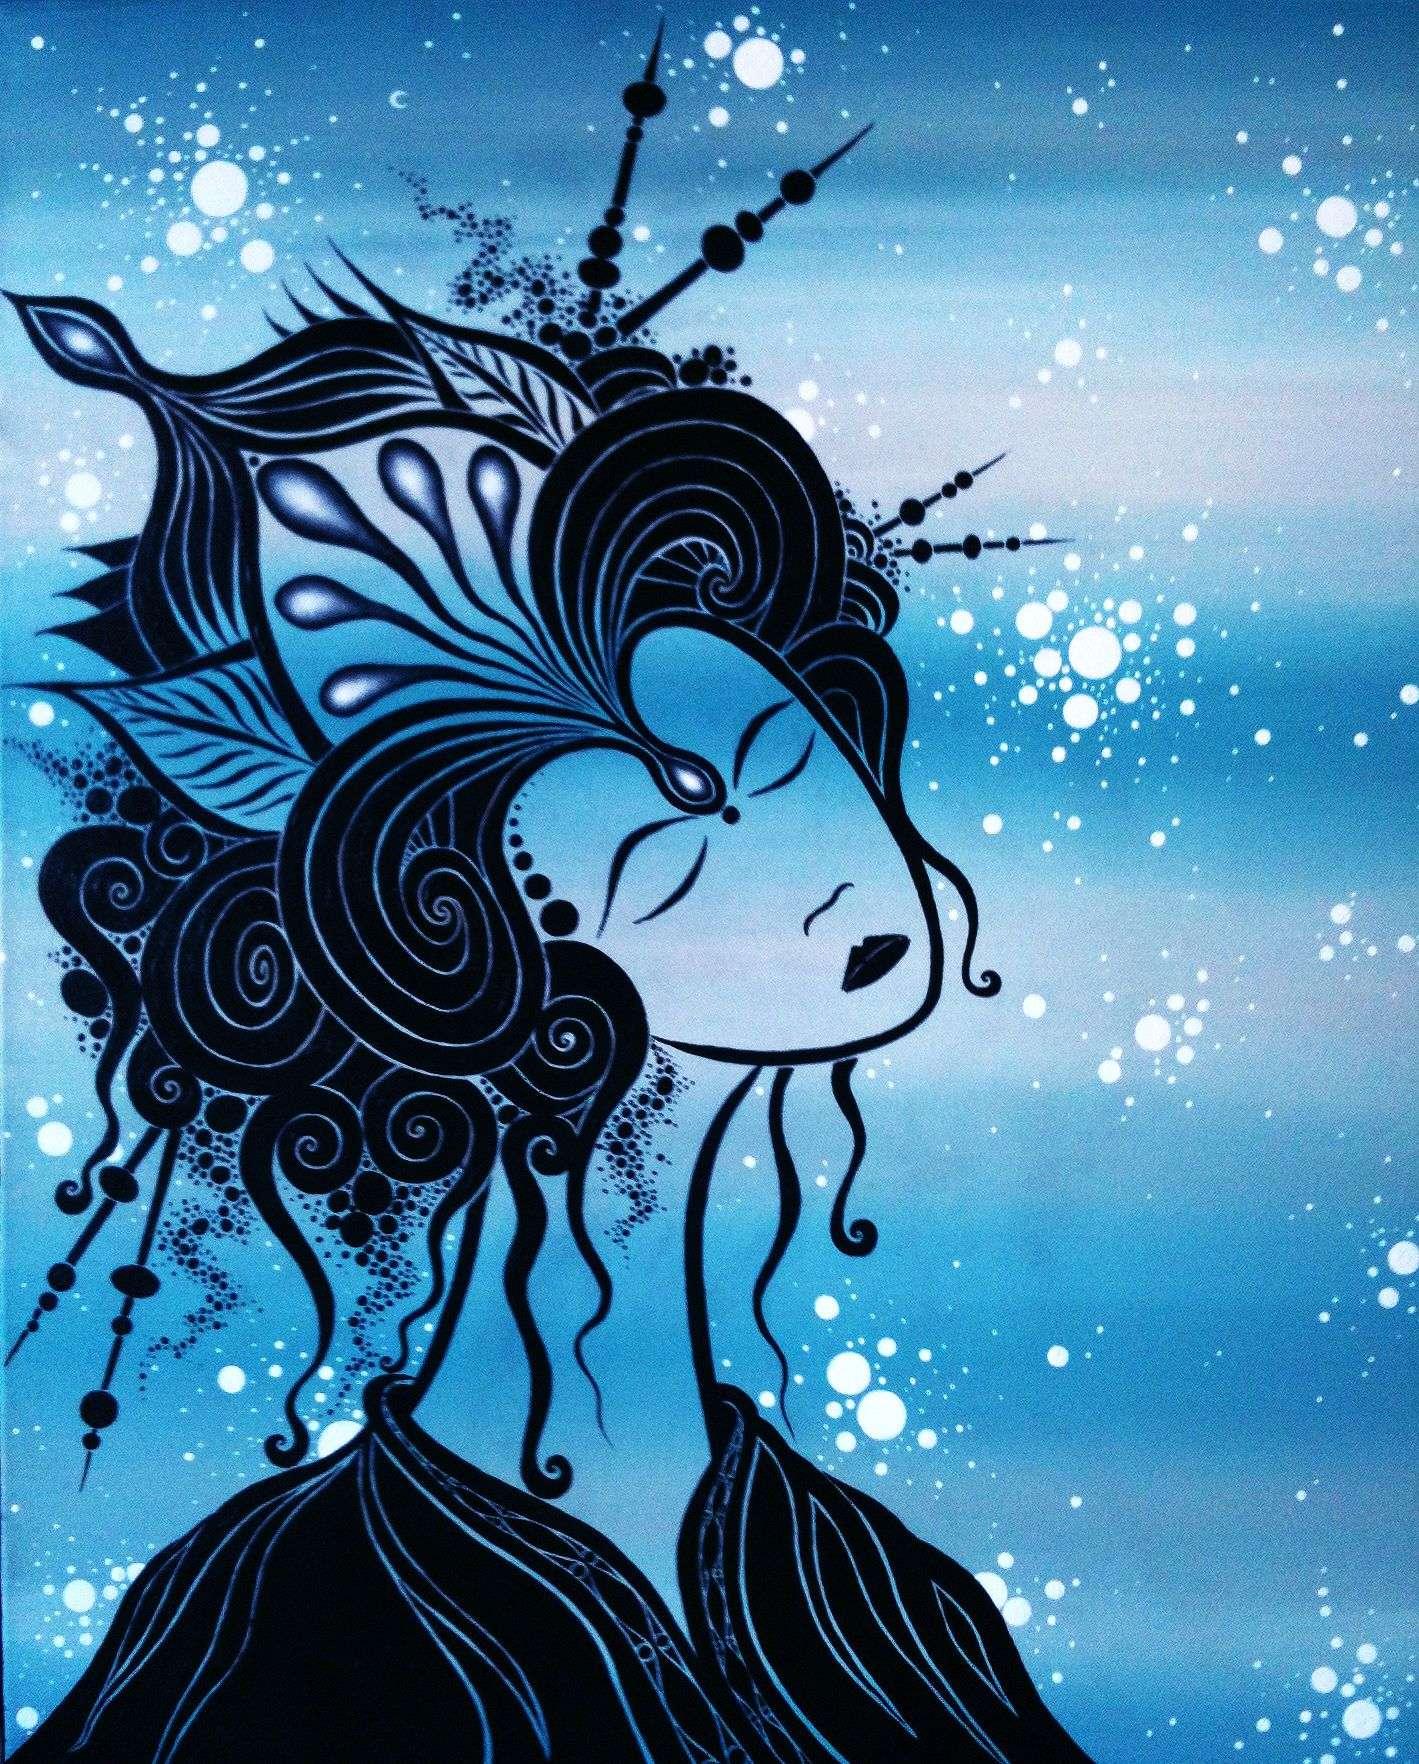 Cosmic geisha II_Jordi Bofill